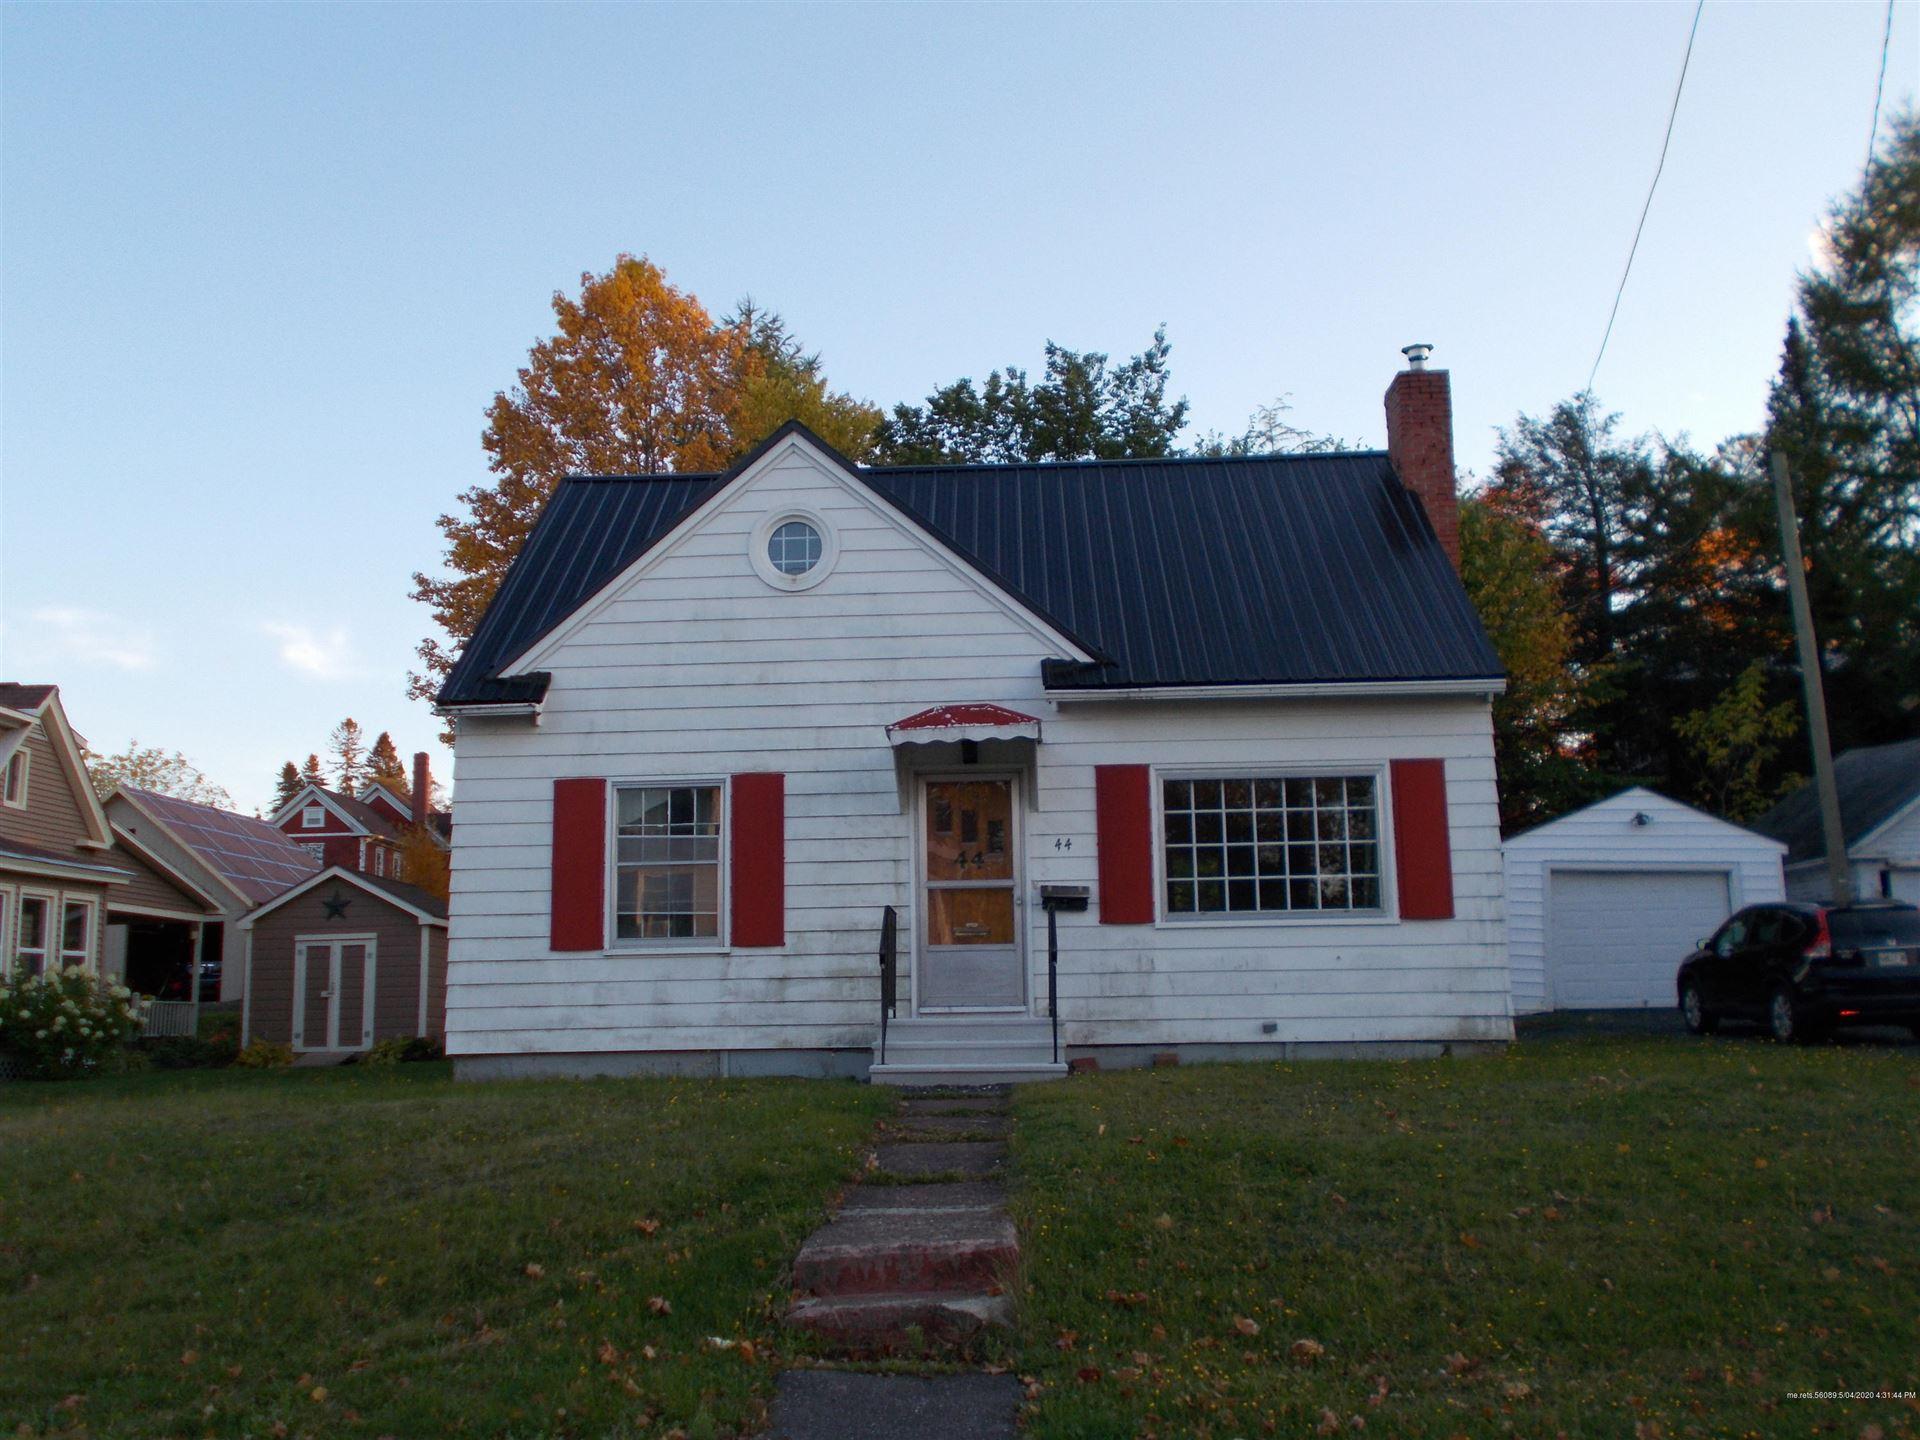 Photo of 44 Church Street, Presque Isle, ME 04769 (MLS # 1451147)